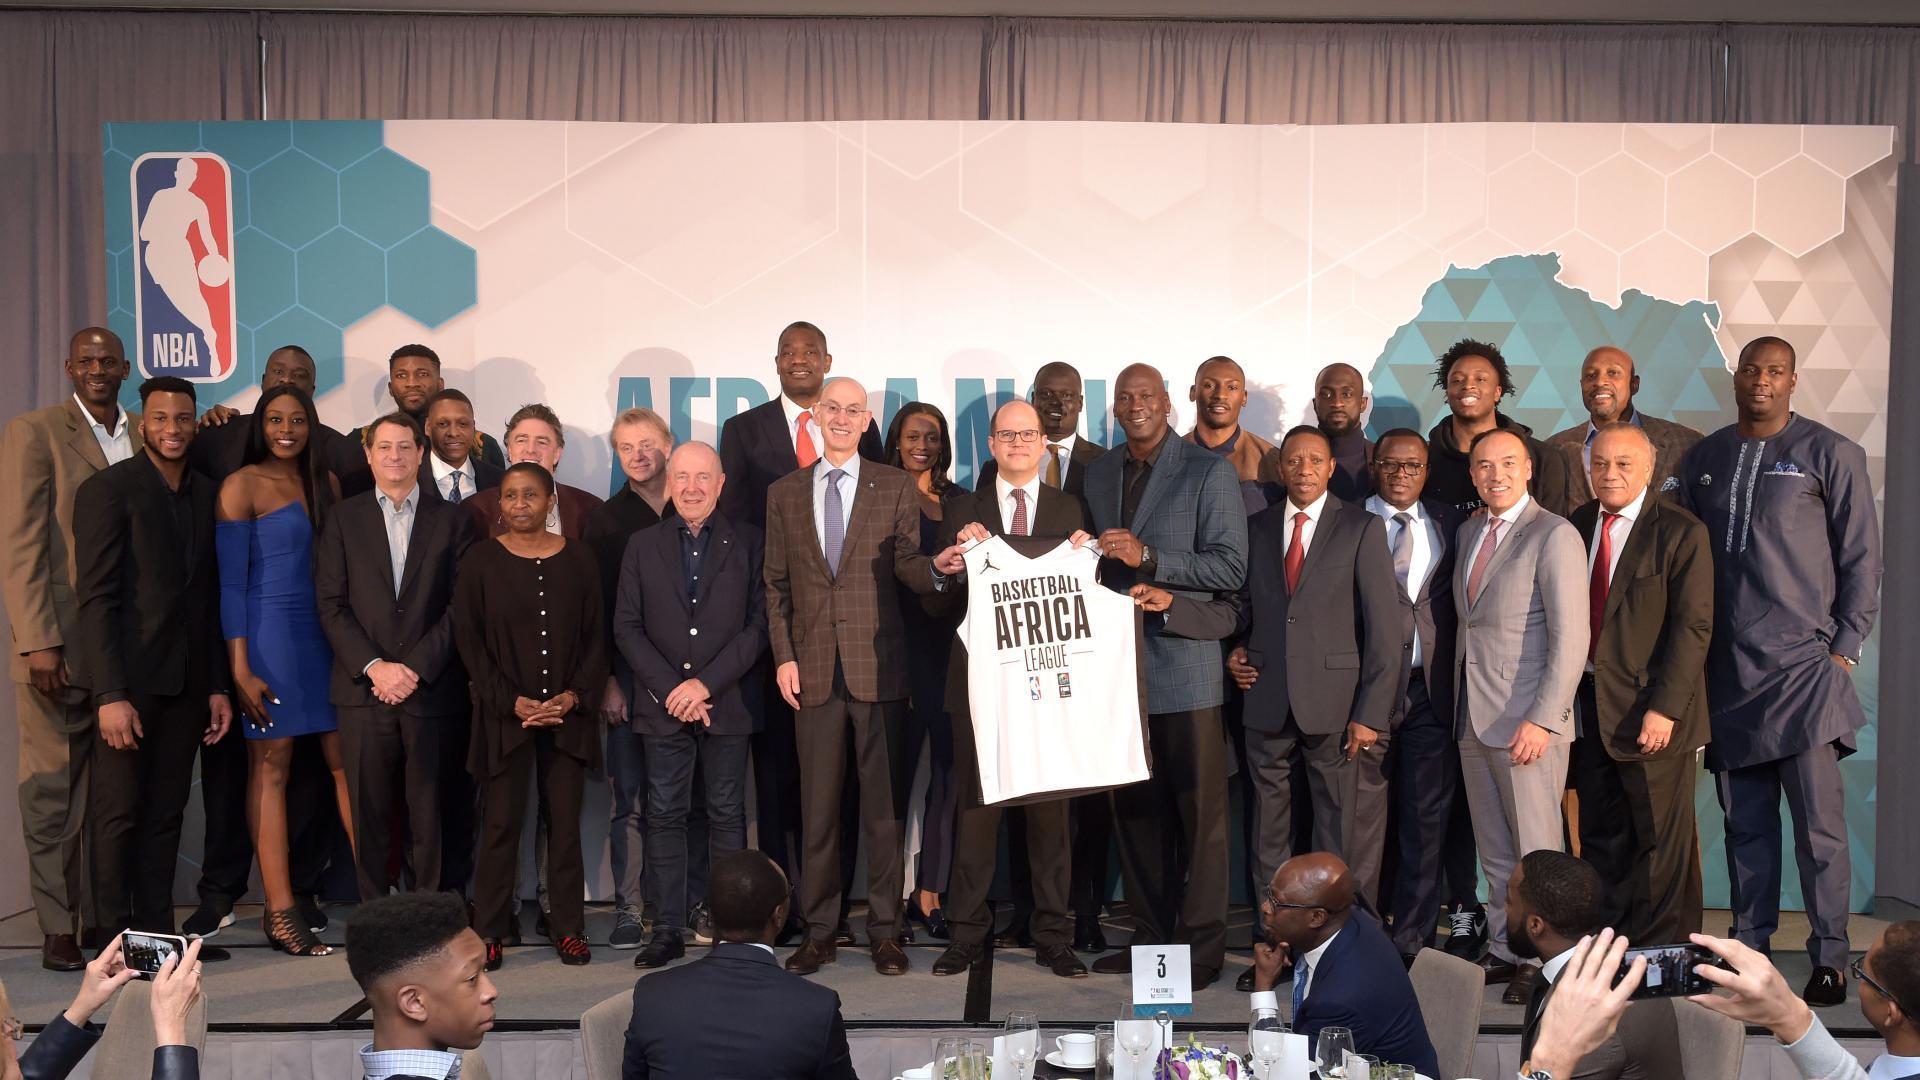 Basketball Africa League announces 7 host cities for inaugural season